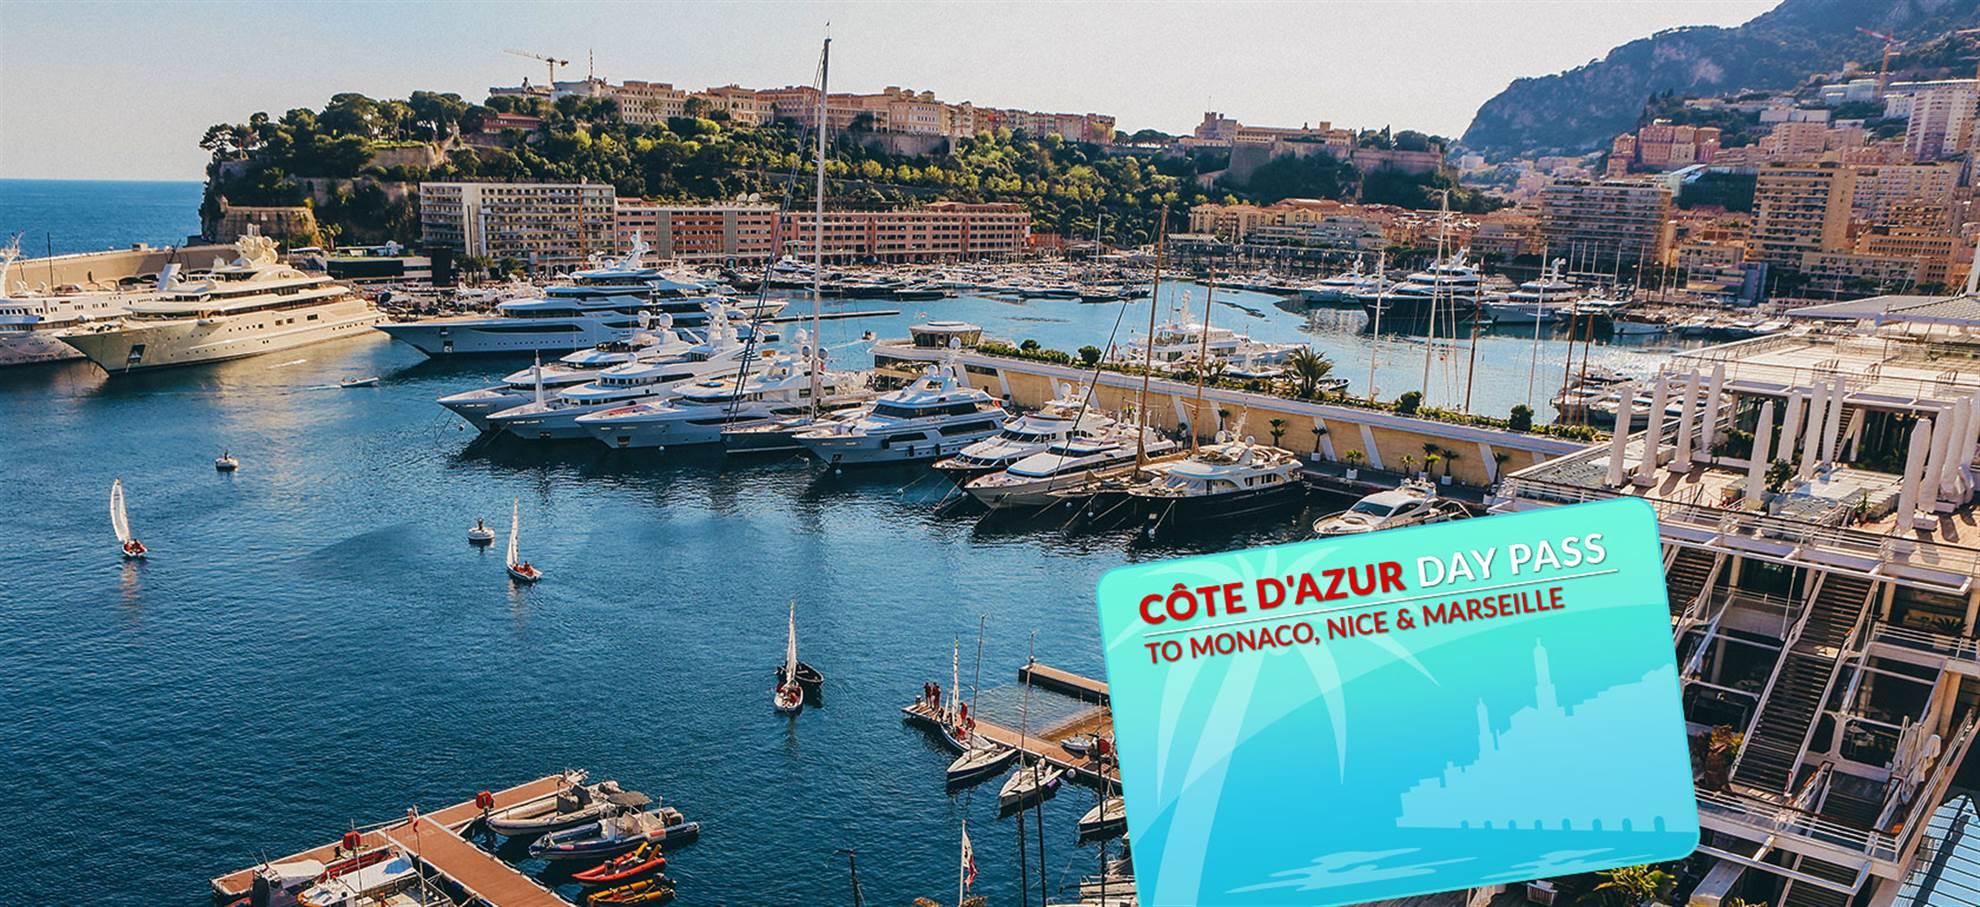 Côte d'Azur Tageskarte nach Marseille/Nizza/Monaco